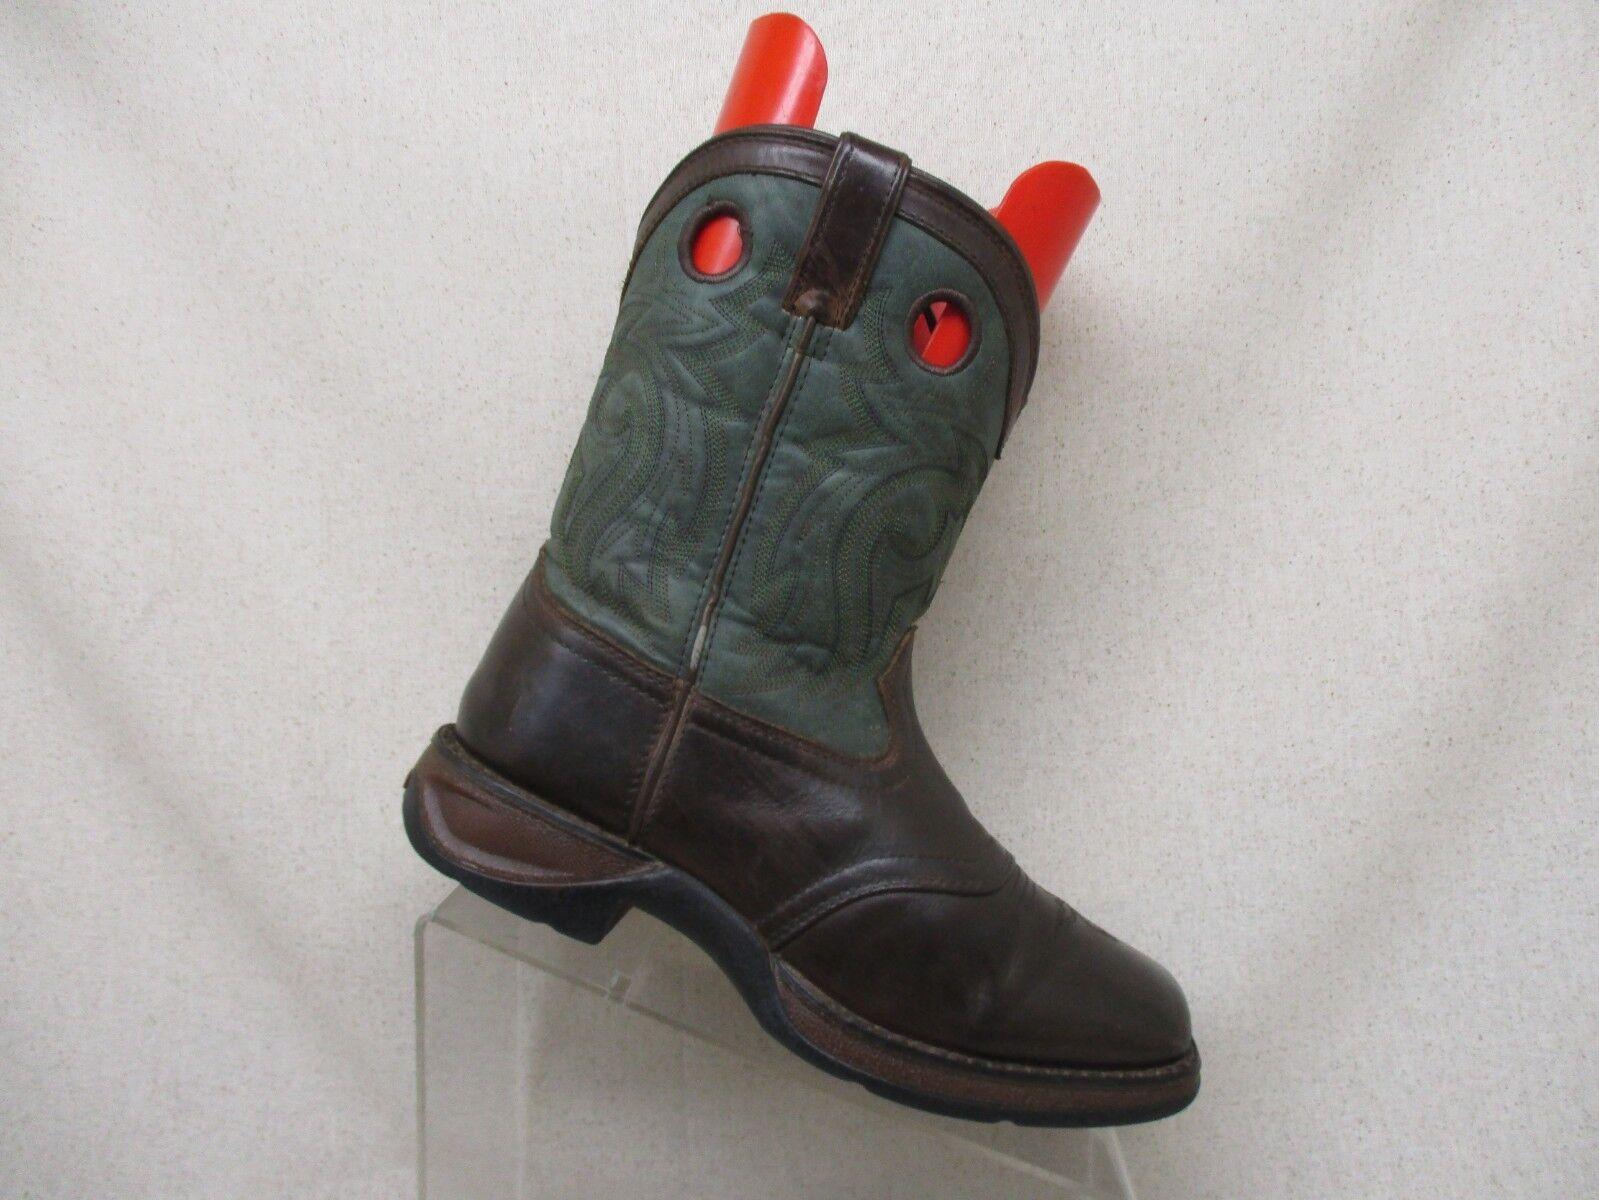 Durango Green Brown Leather Buckaroo Cowboy Boots Mens Size 5 M Style DWBT047